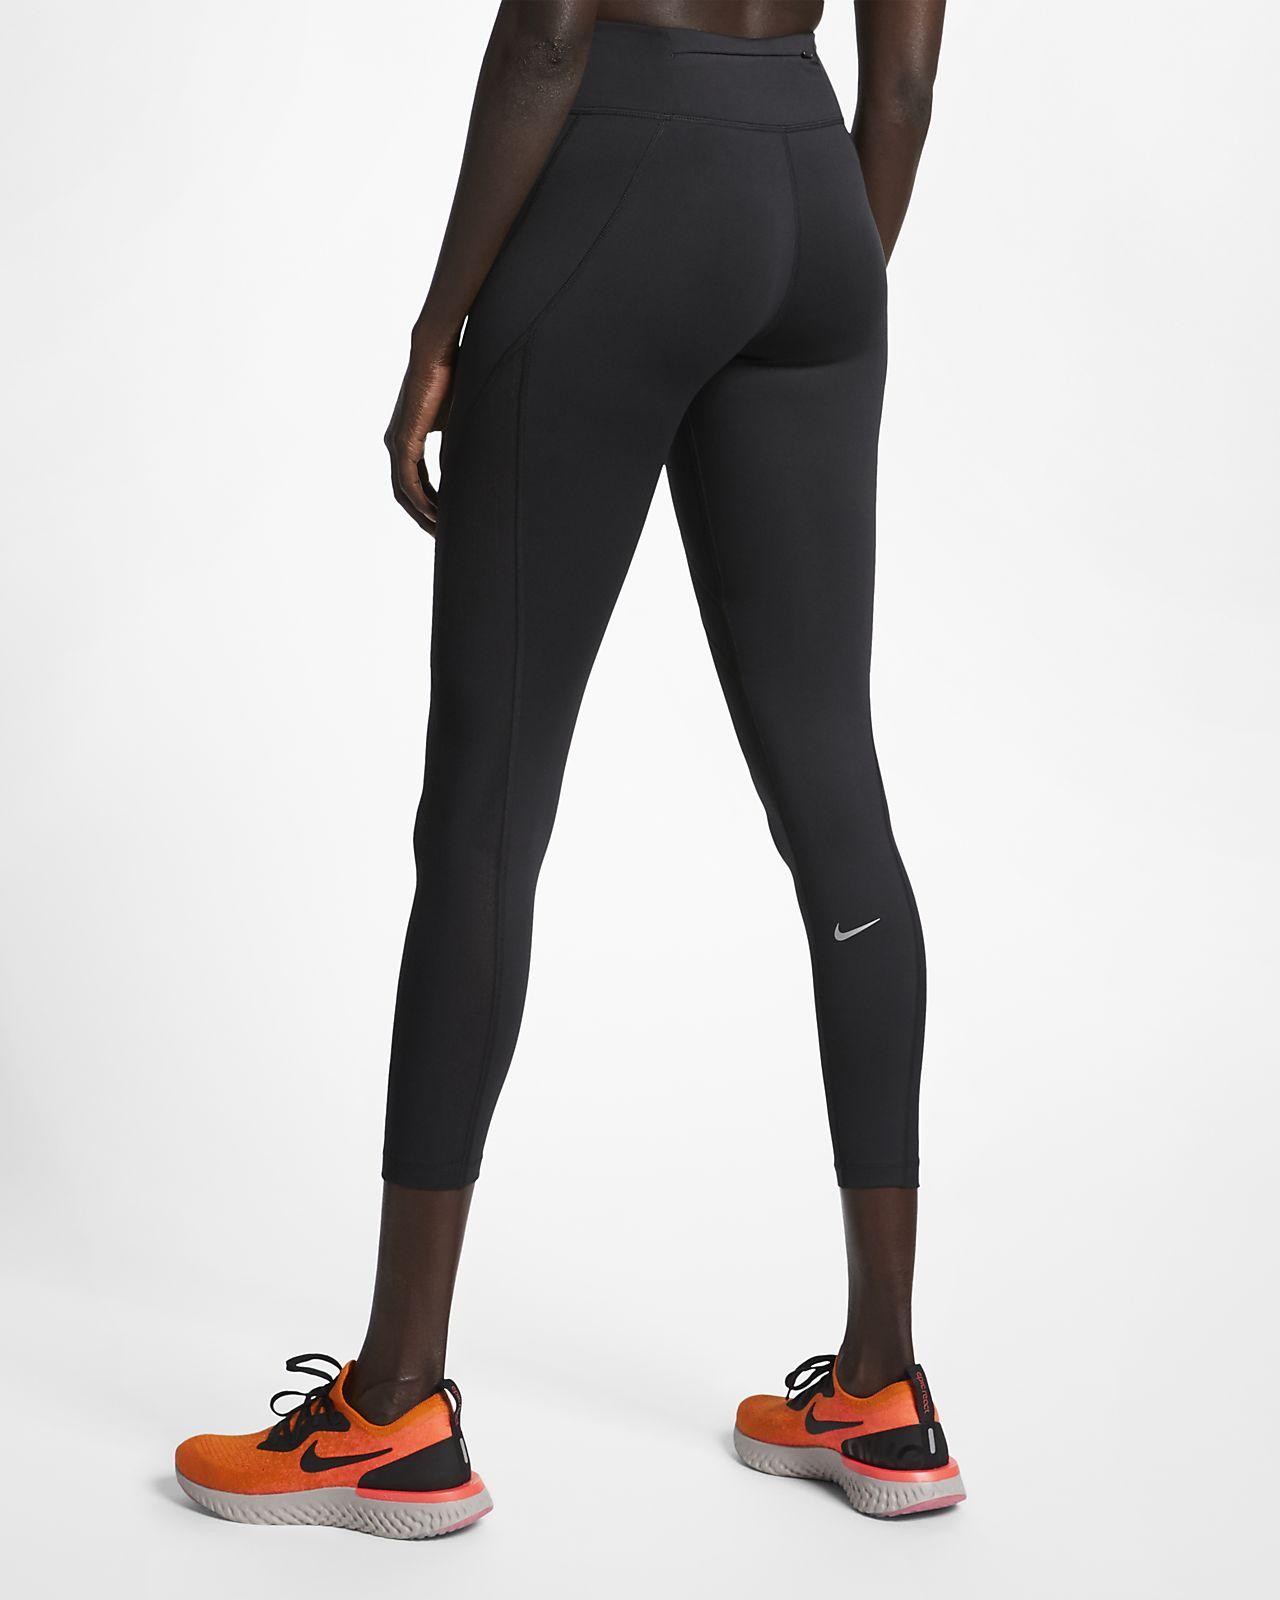 c8bdff0d33d Nike Epic Lux 7/8-hardlooptights voor dames. Nike.com BE